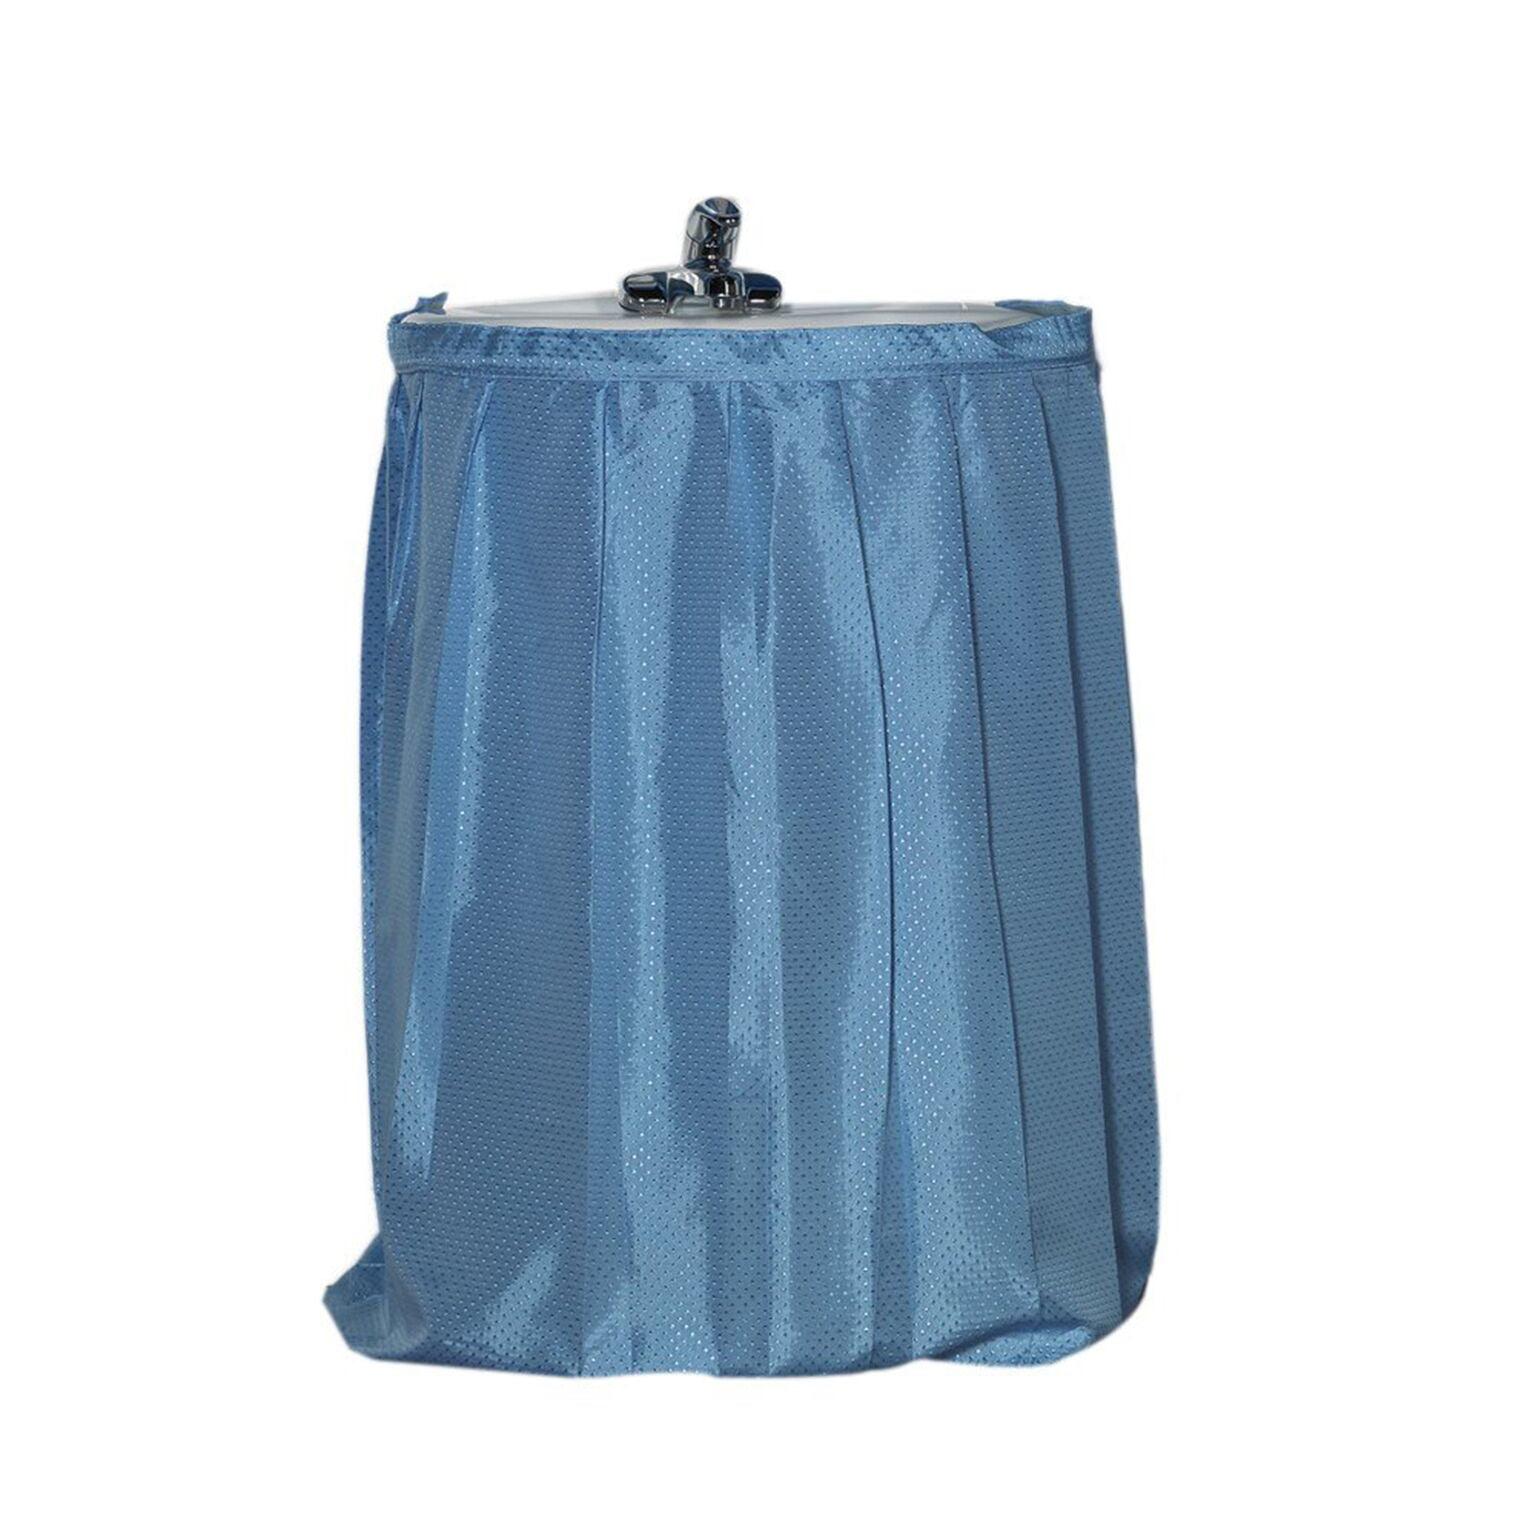 Fabric Bathroom Dobby Sink Skirt/Drape - Light Blue ...